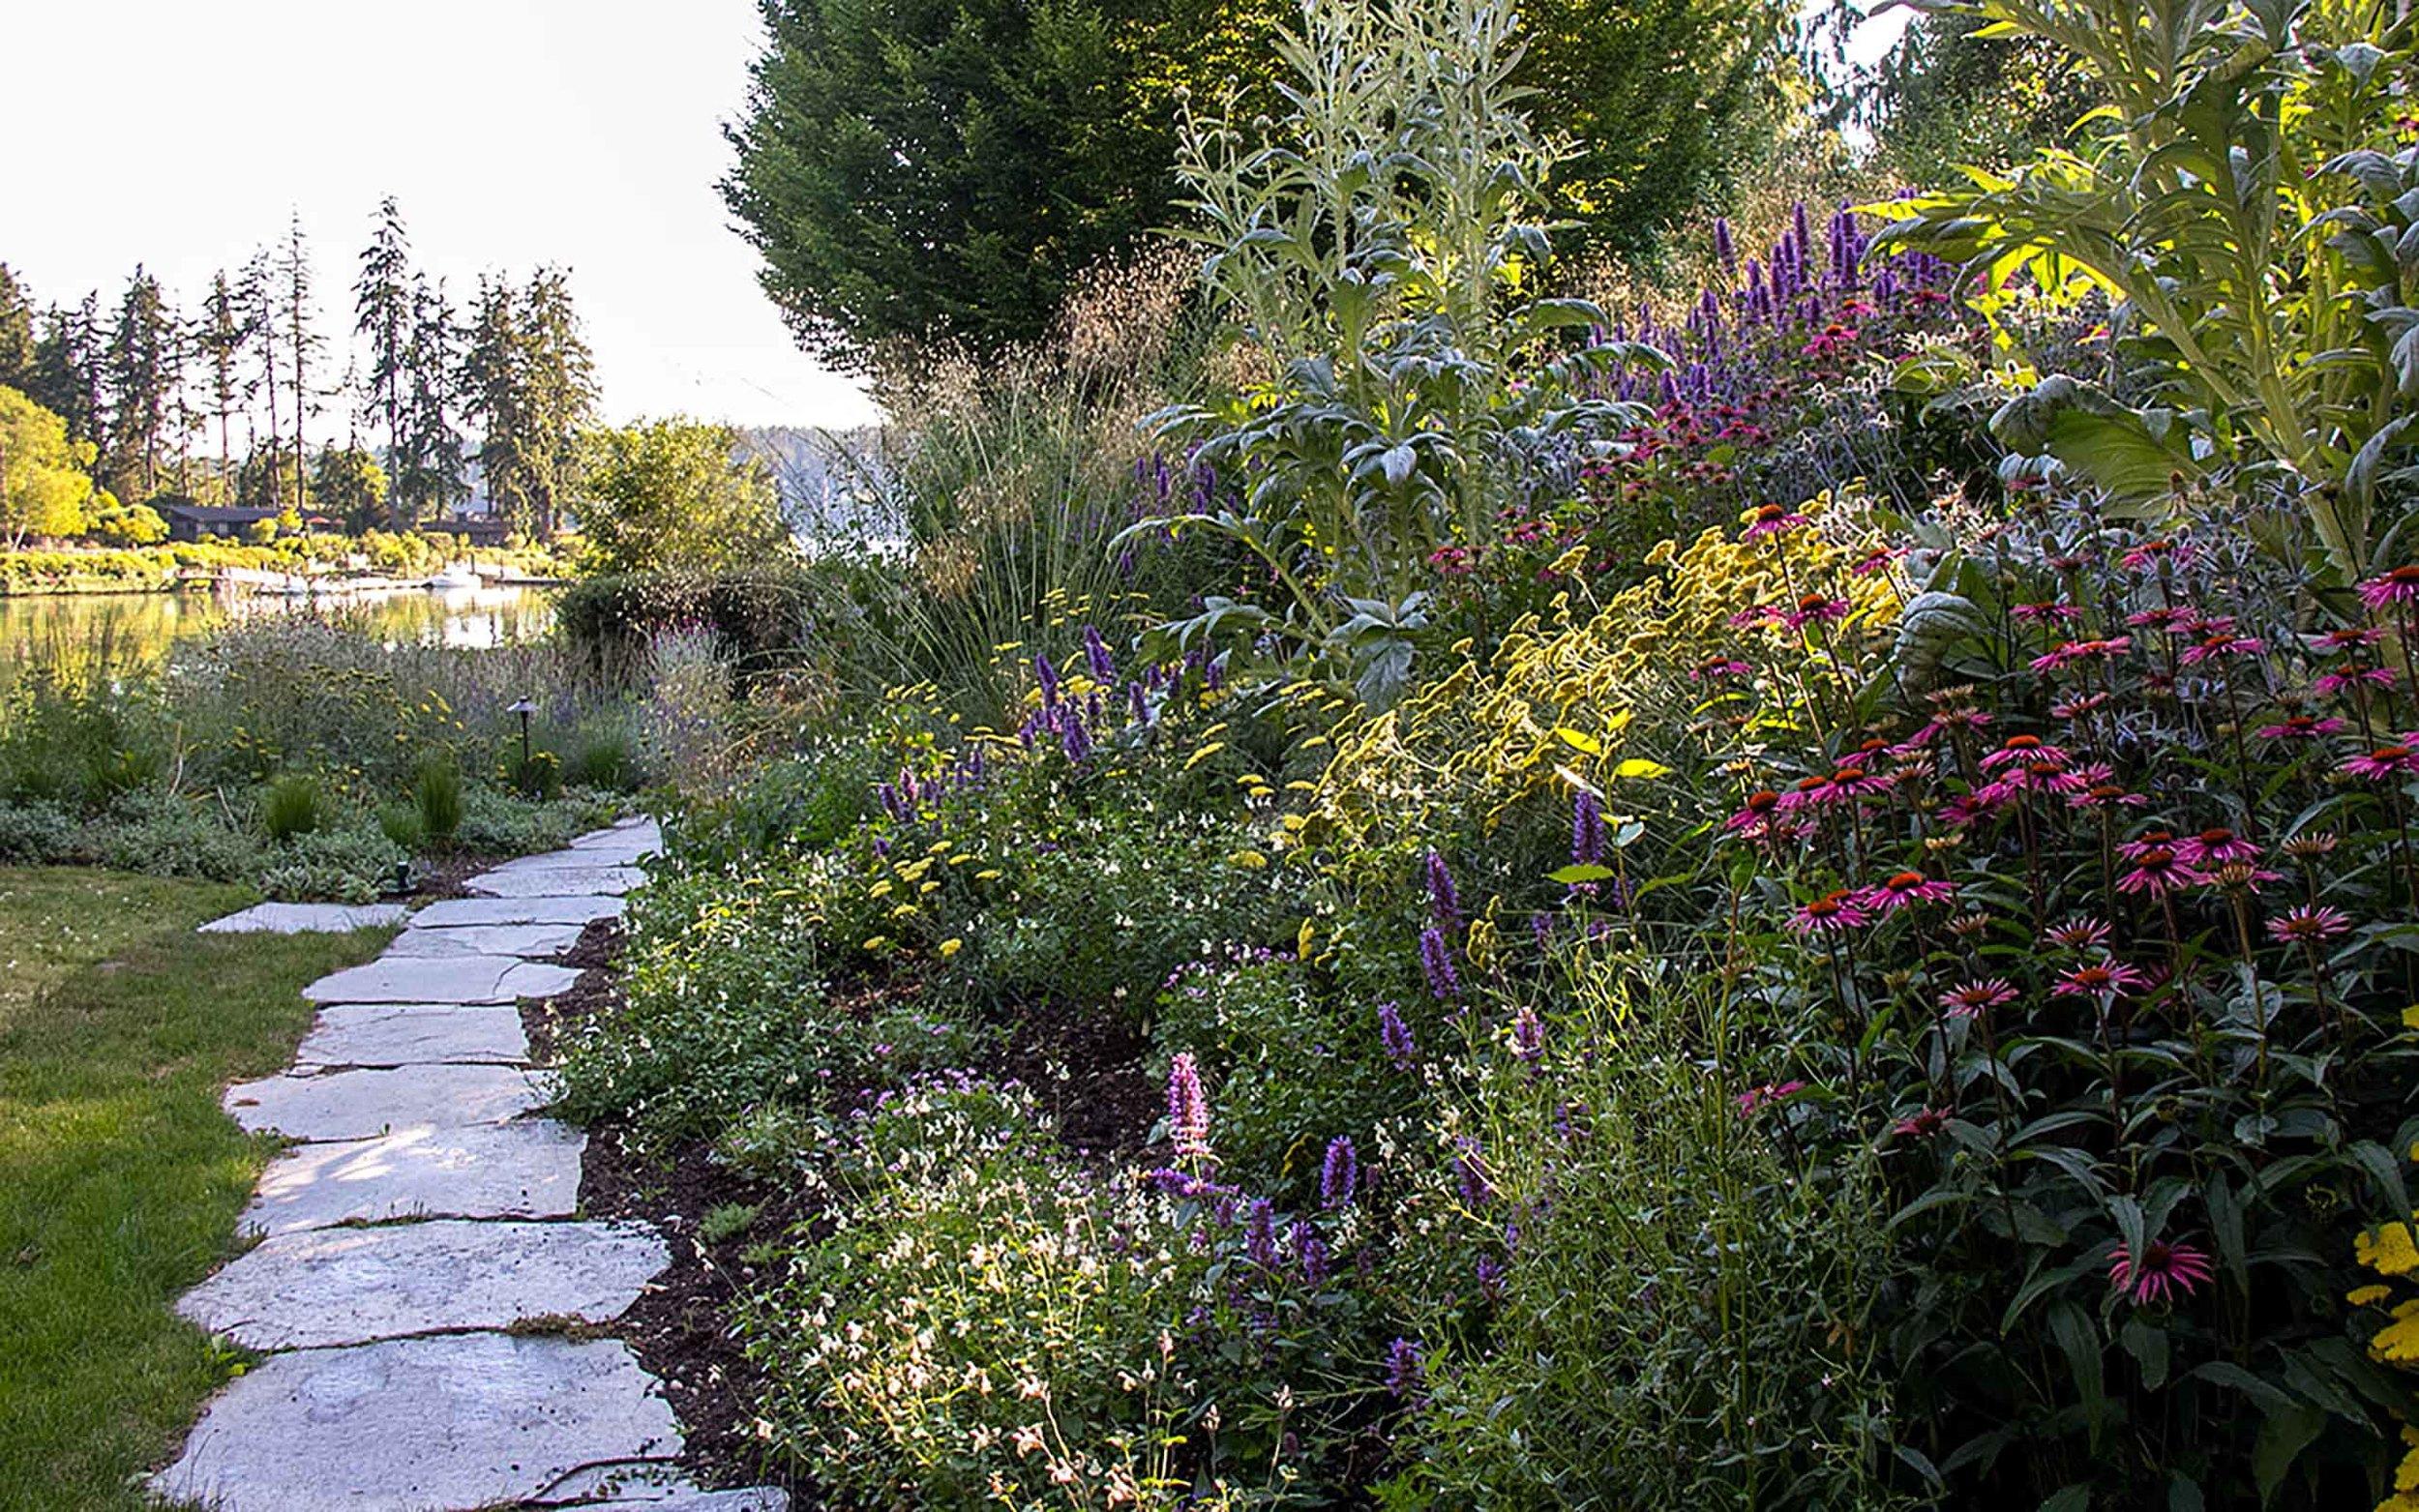 My garden on Bainbridge Island, Washington.